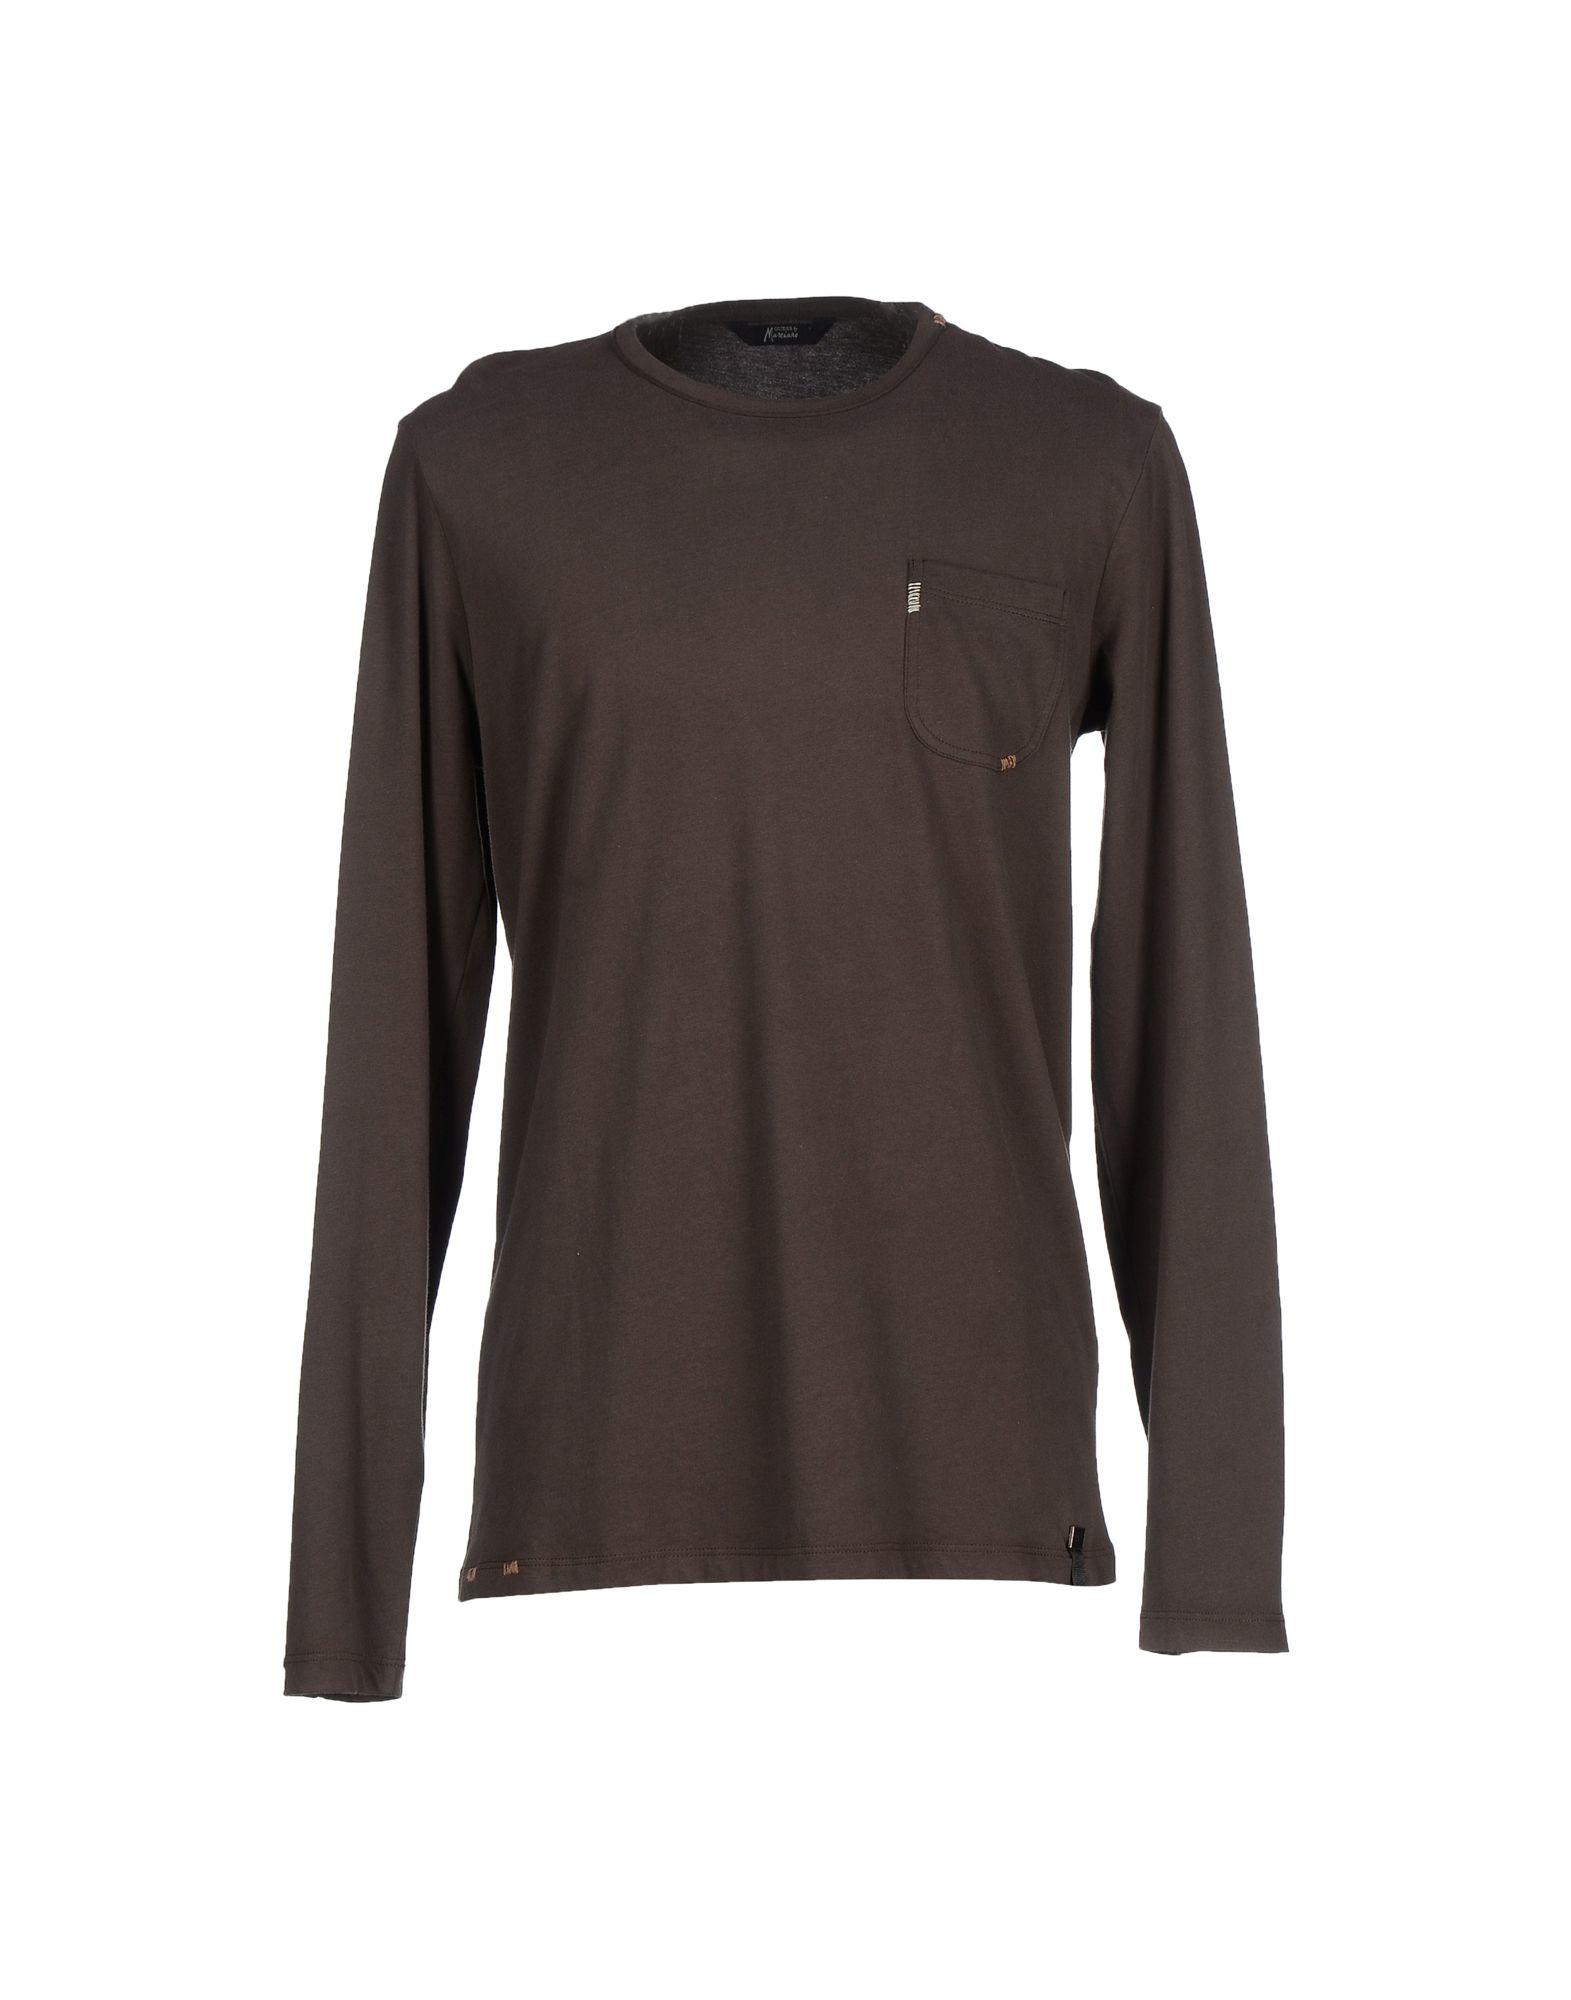 lyst guess t shirt in brown for men. Black Bedroom Furniture Sets. Home Design Ideas